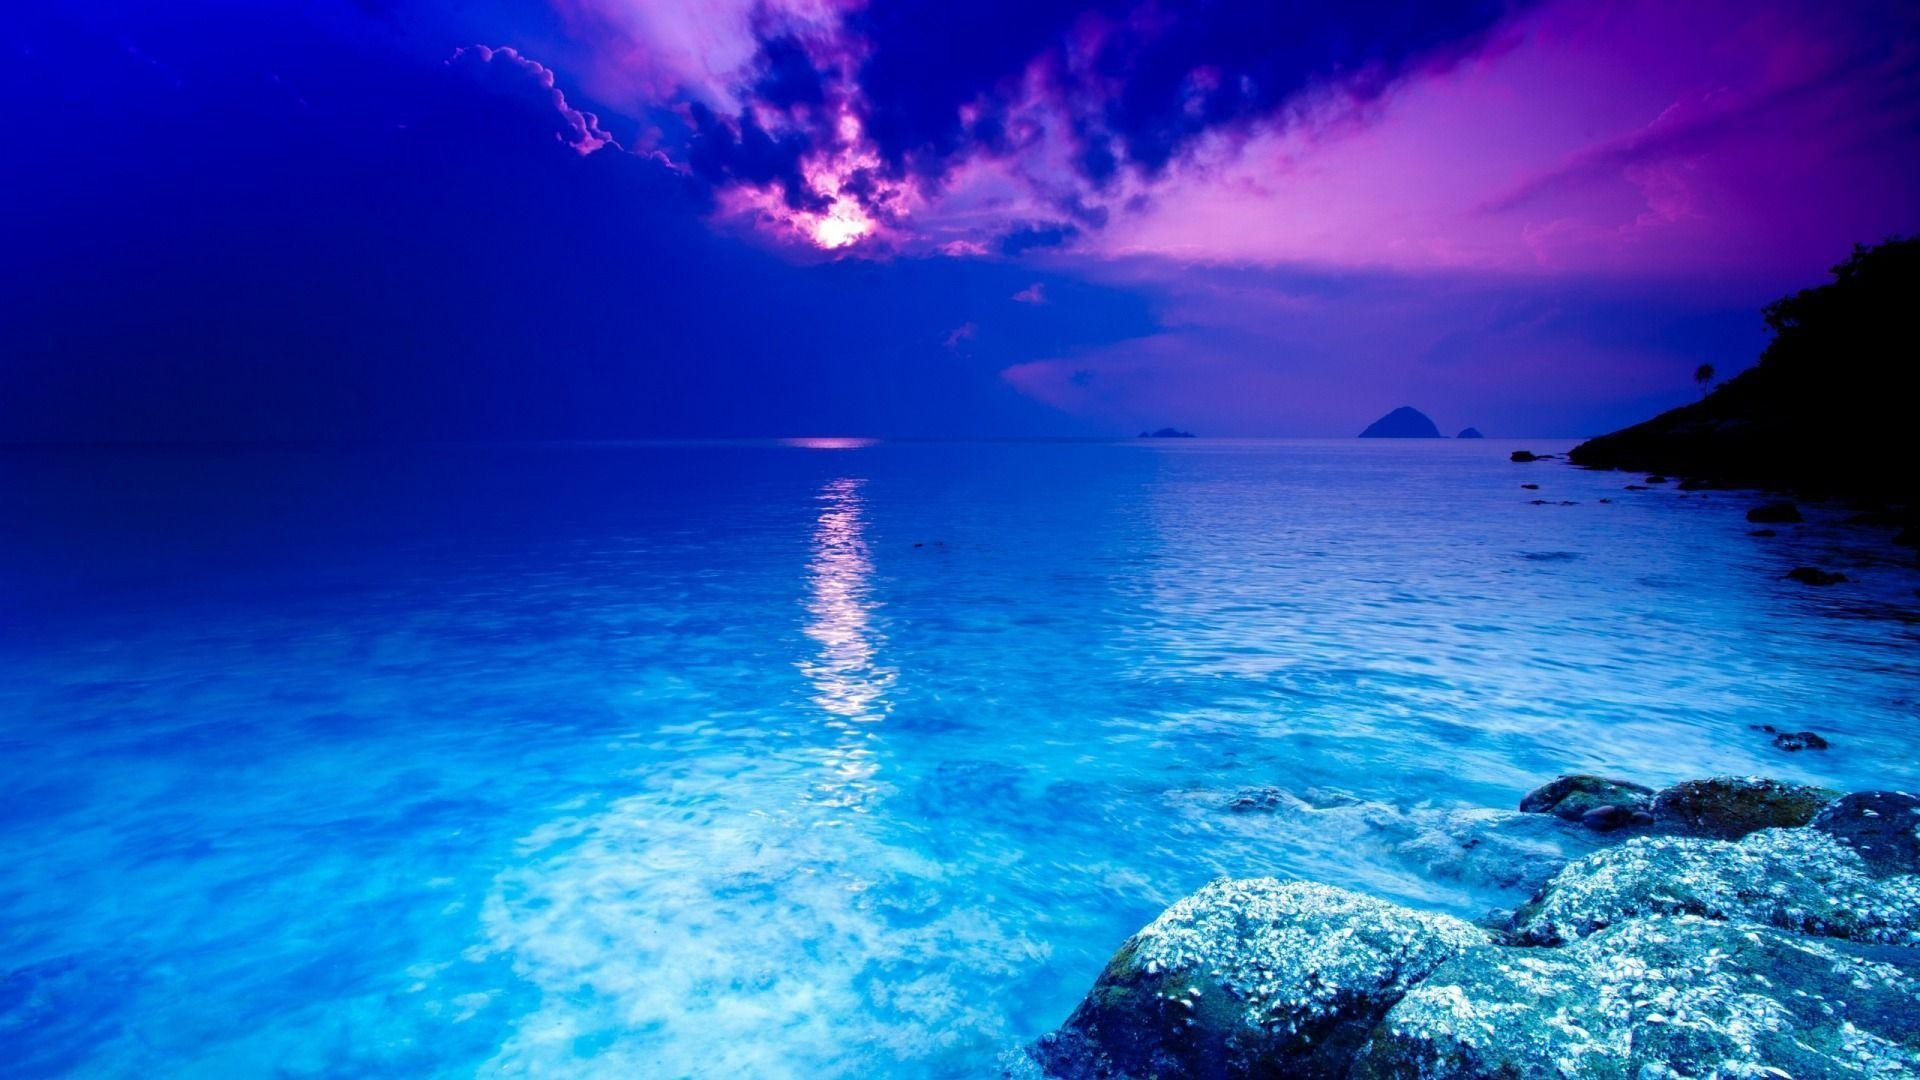 Blue Ocean HD Wallpapers – HD Wallpapers Inn